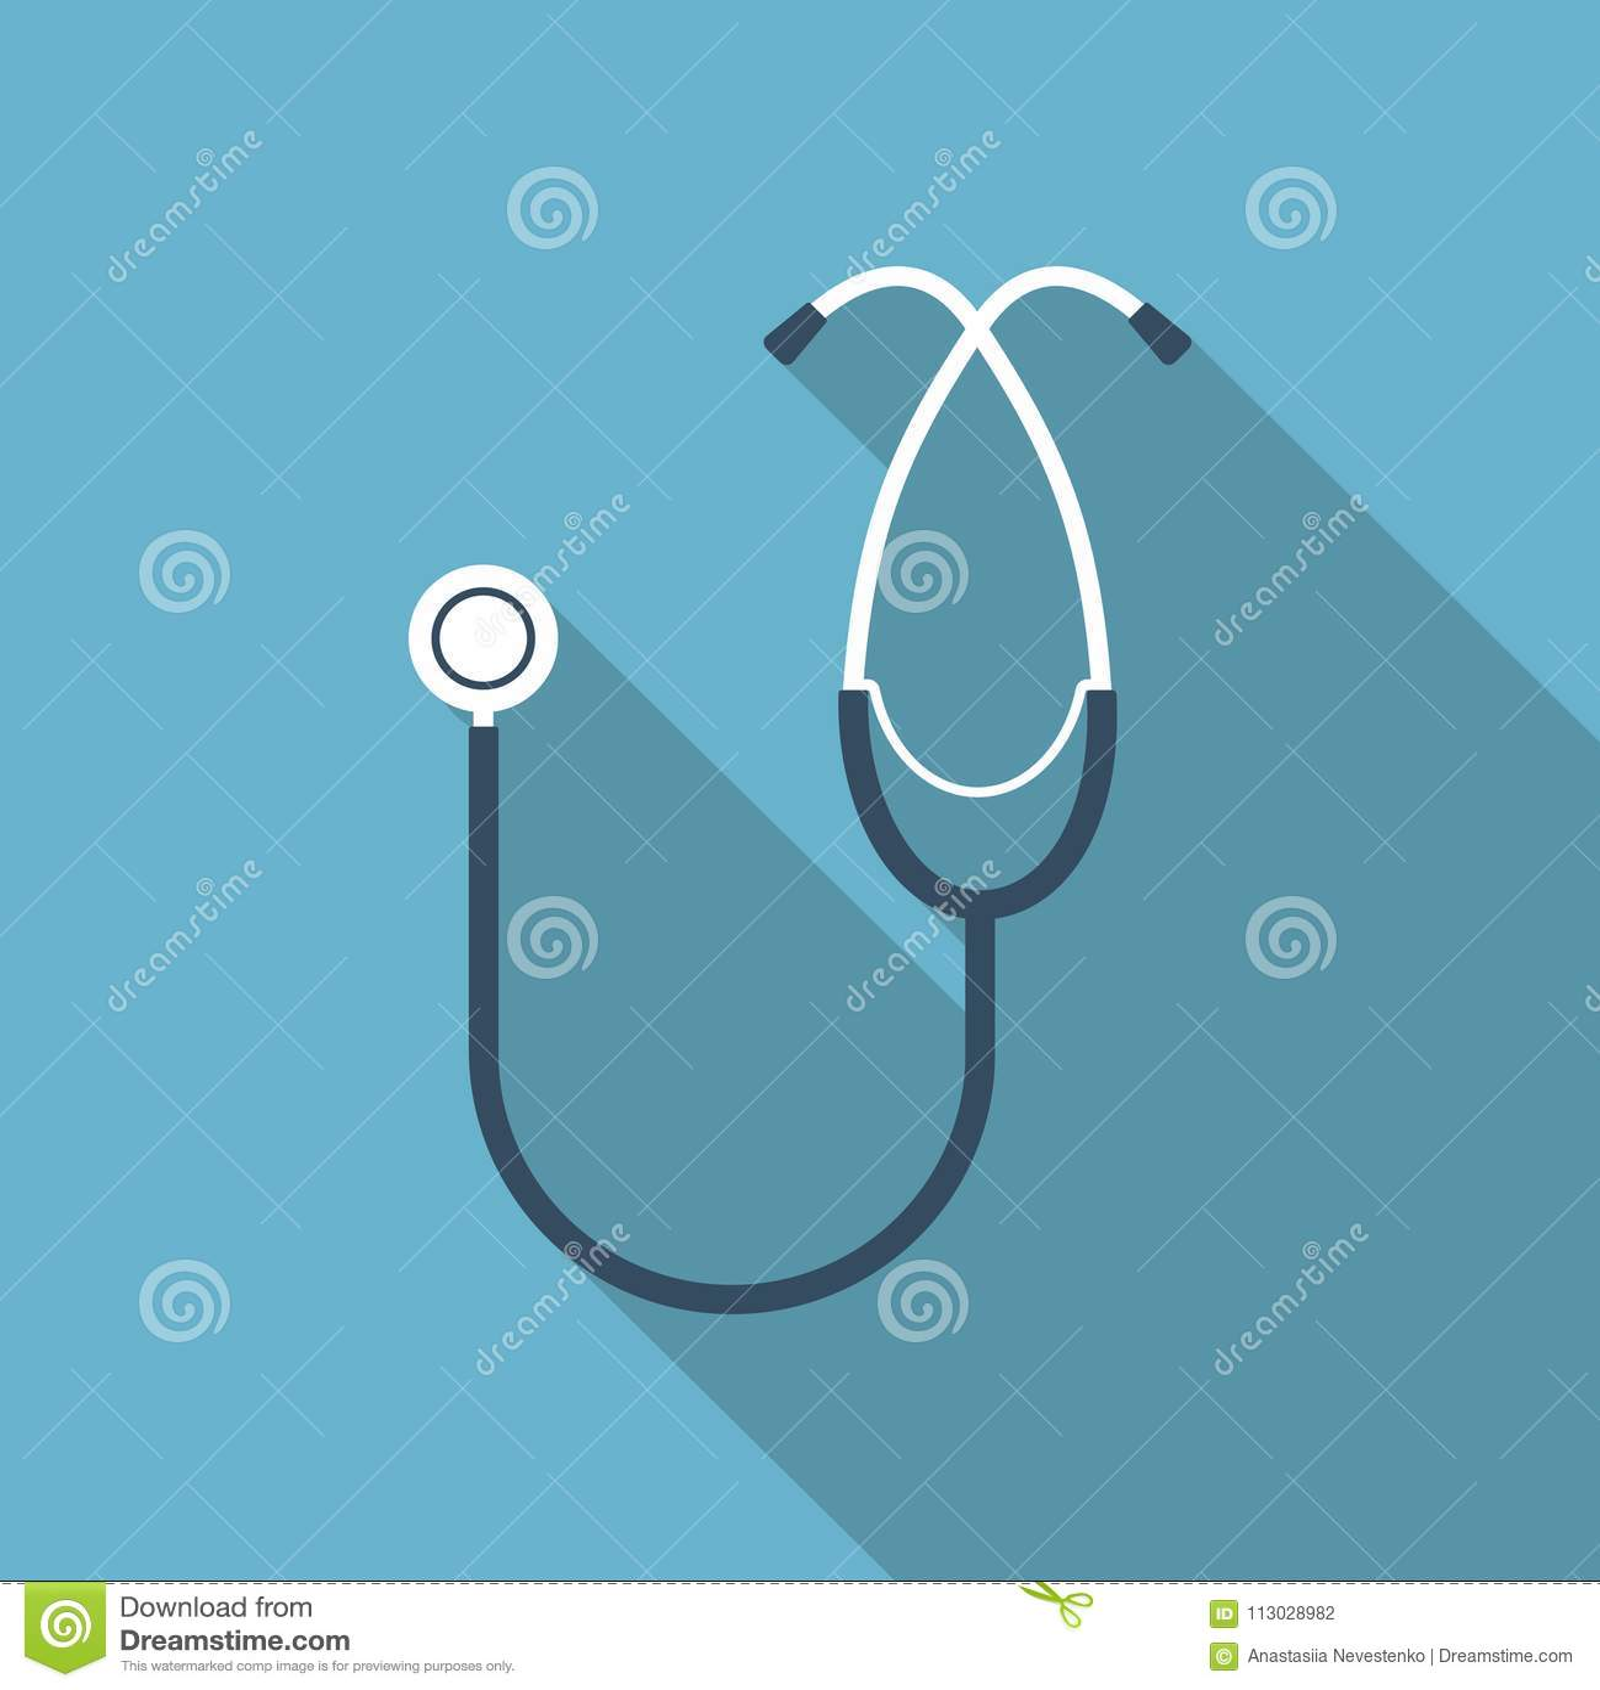 Herramienta de diagnósticos médica